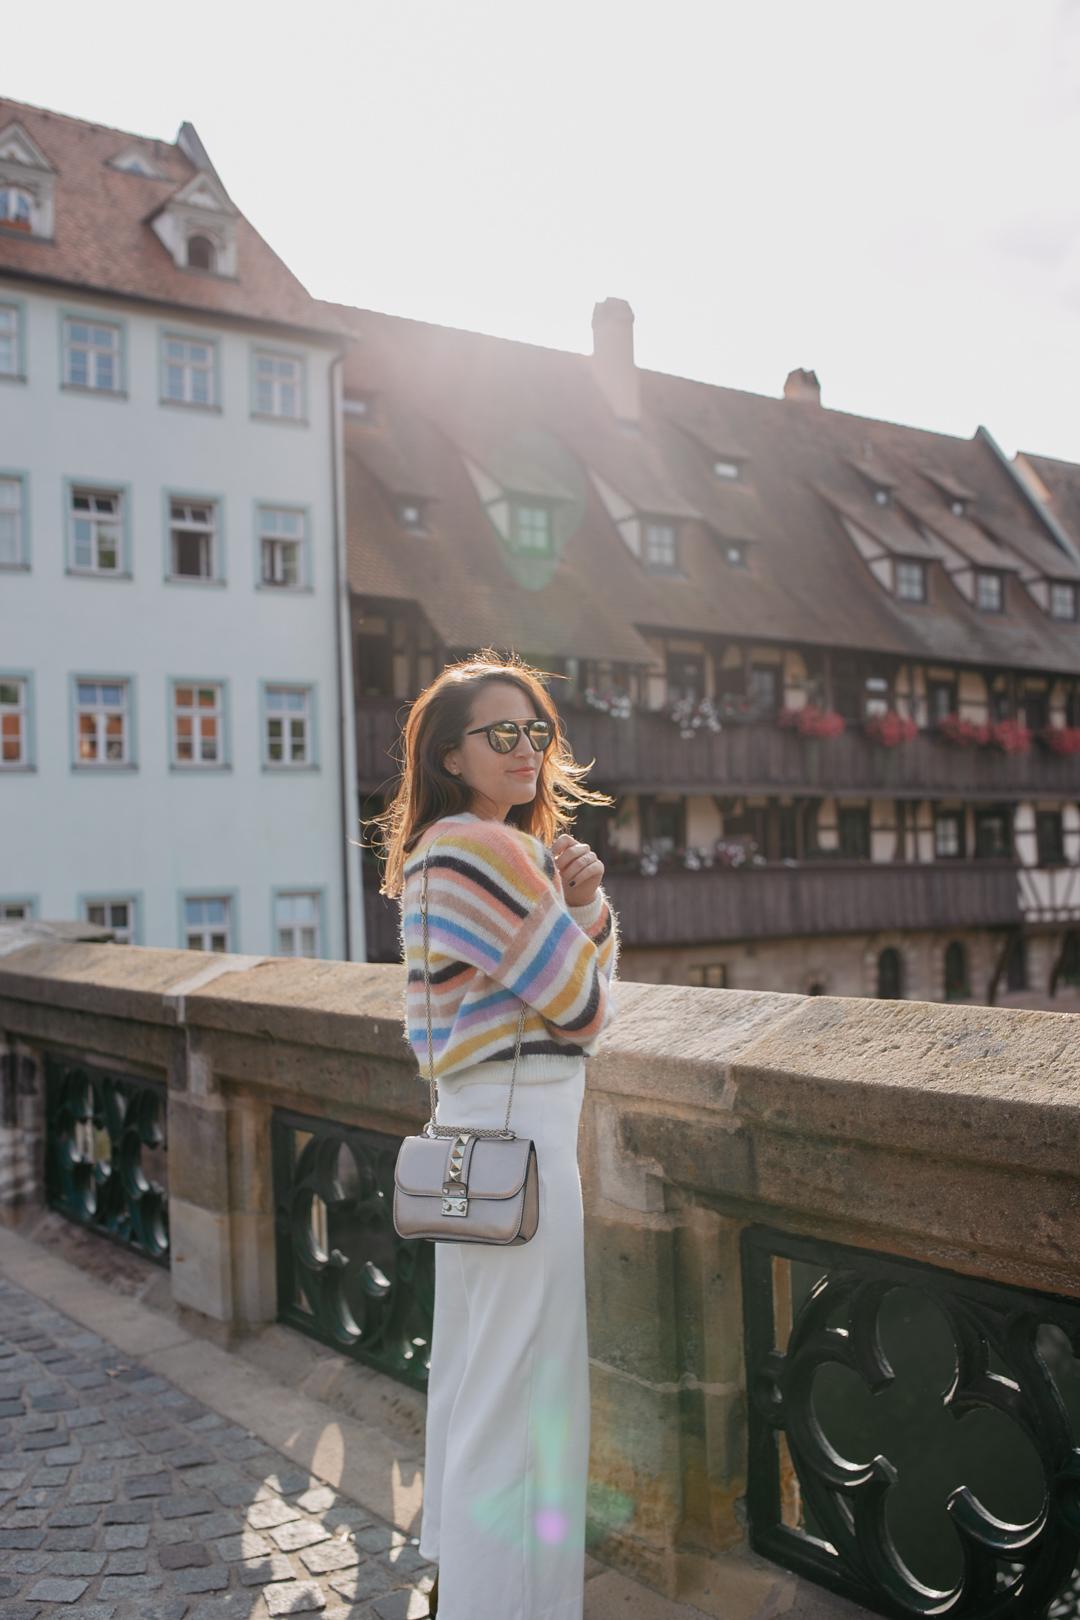 Herbstfavorit: Bunter Strick | www.piecesofmariposa - Fashion & Lifestyle Blog aus Nürnberg